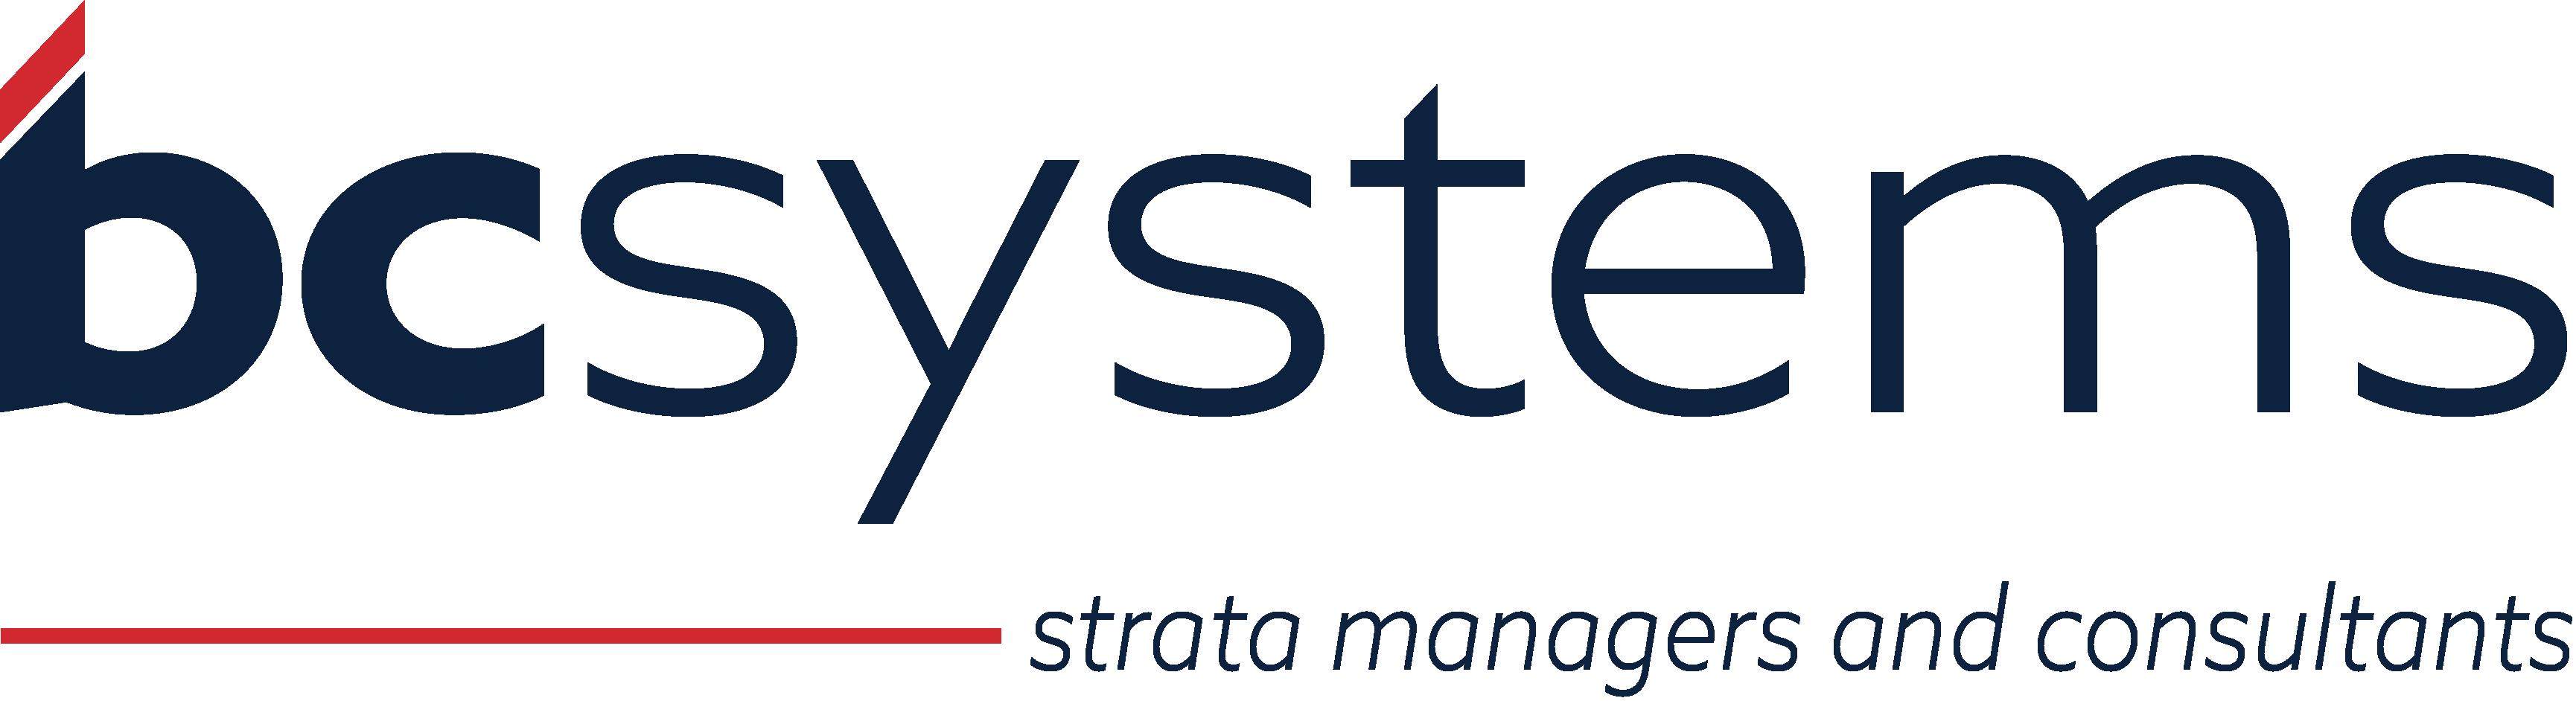 BCsystems logo